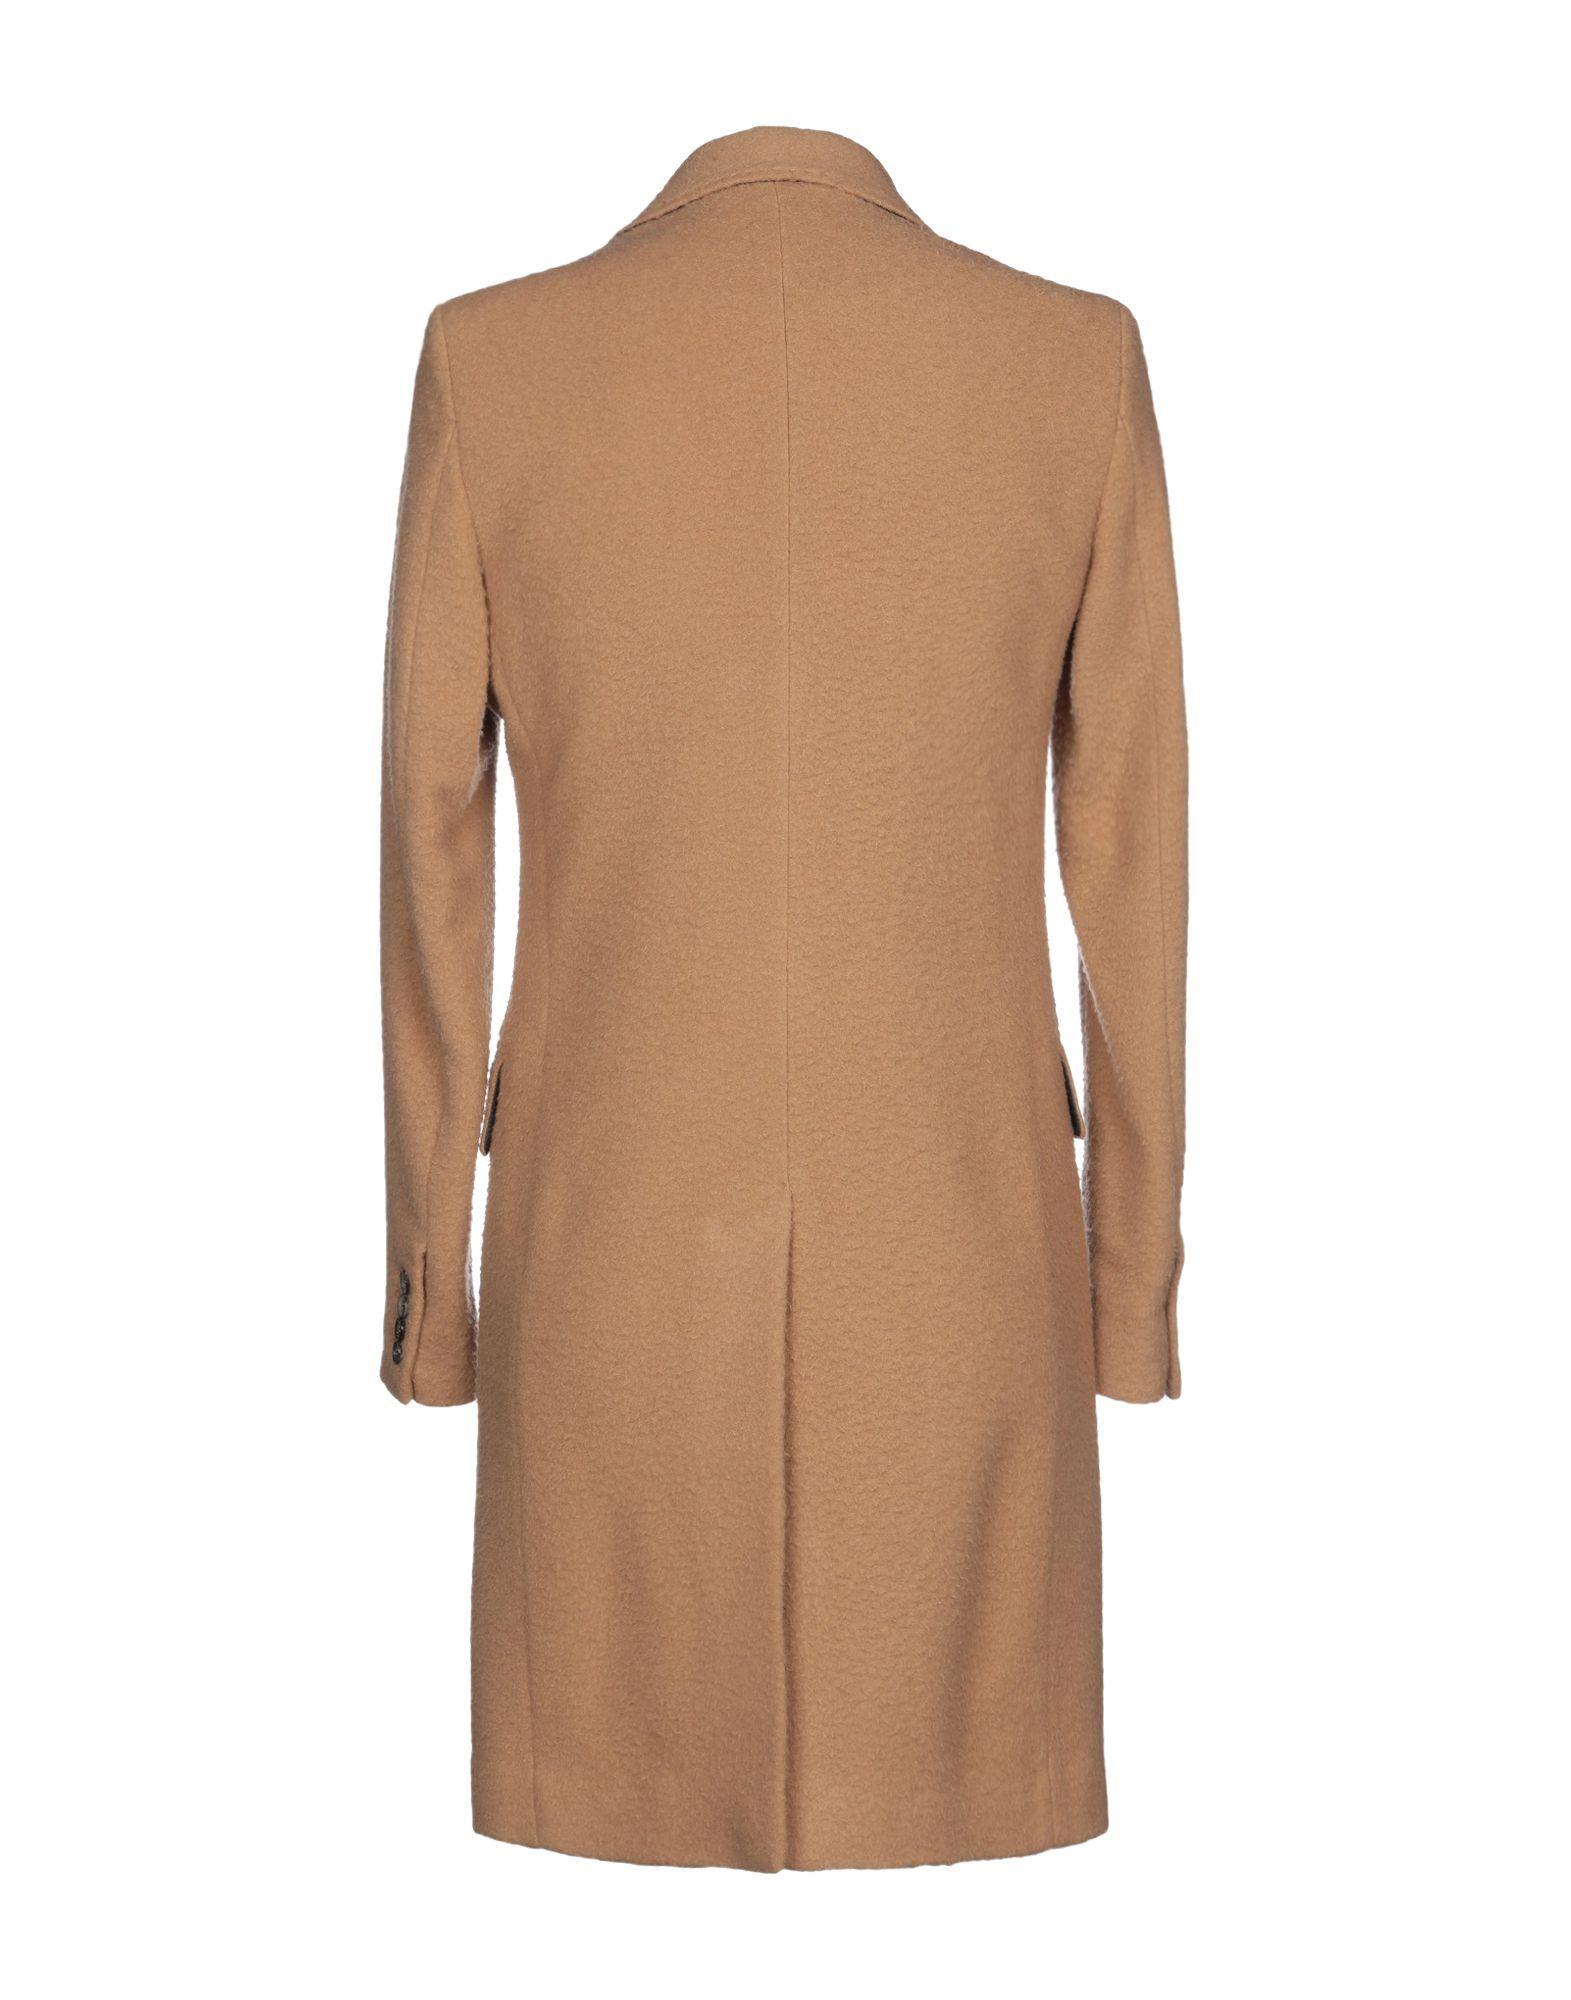 COATS & JACKETS Opifici Casentinesi� Camel Man Virgin Wool